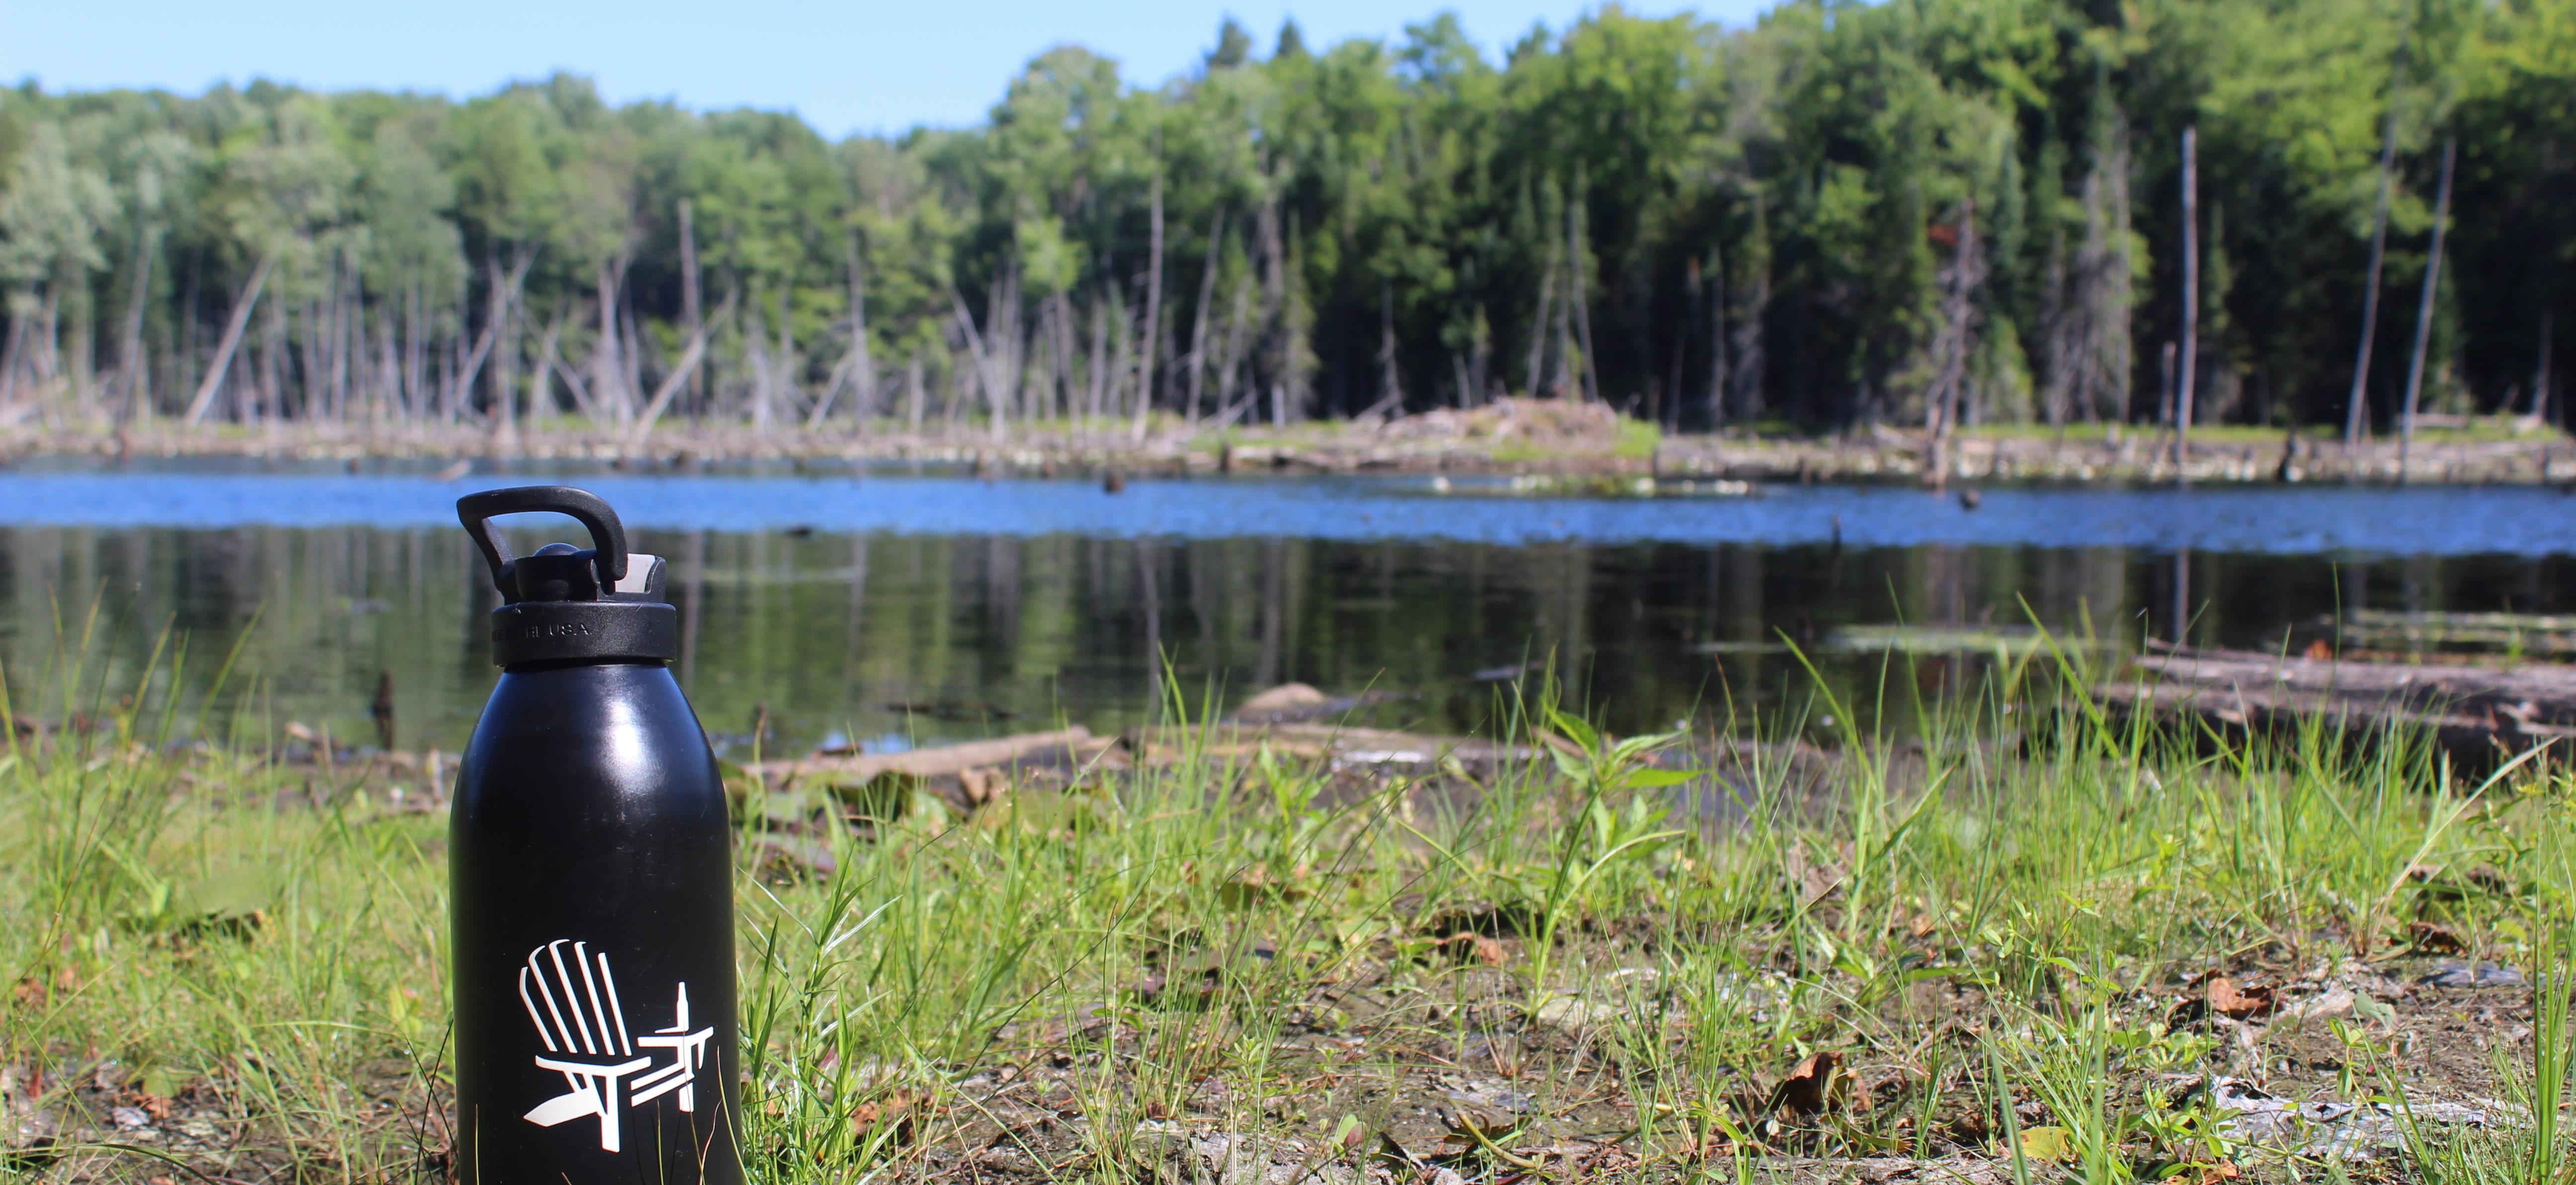 Muskoka Brewery bottle on the wetlands of Upjohn Conservation Area